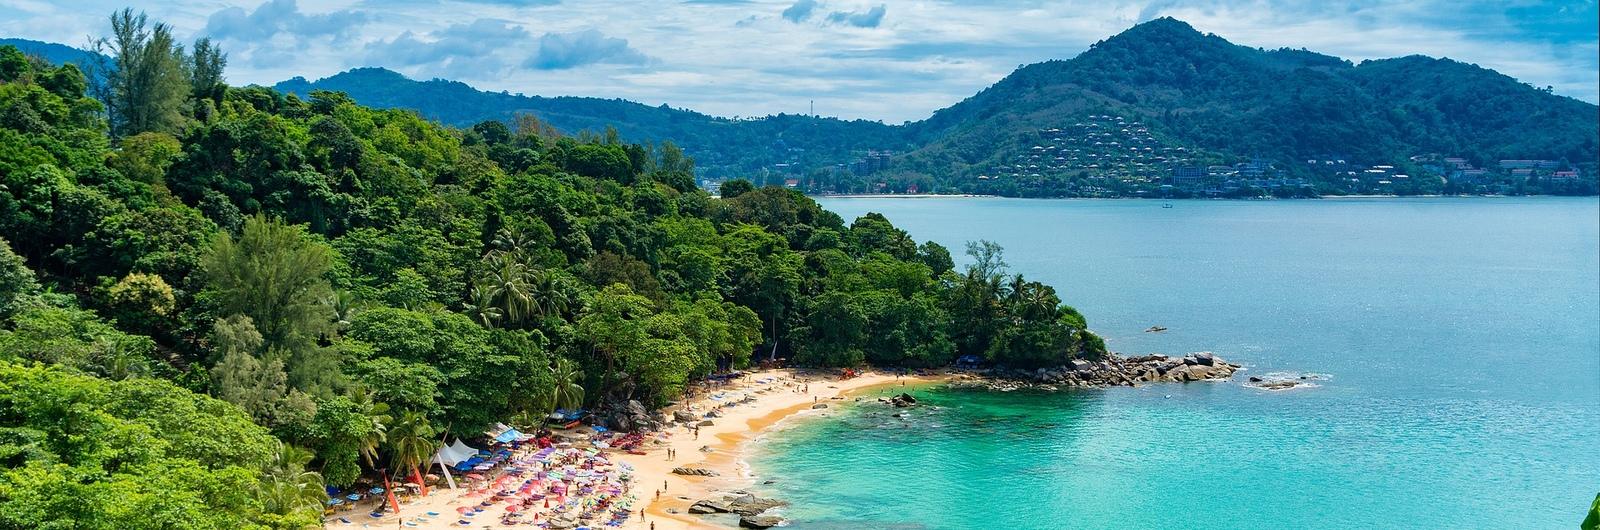 phuket city header